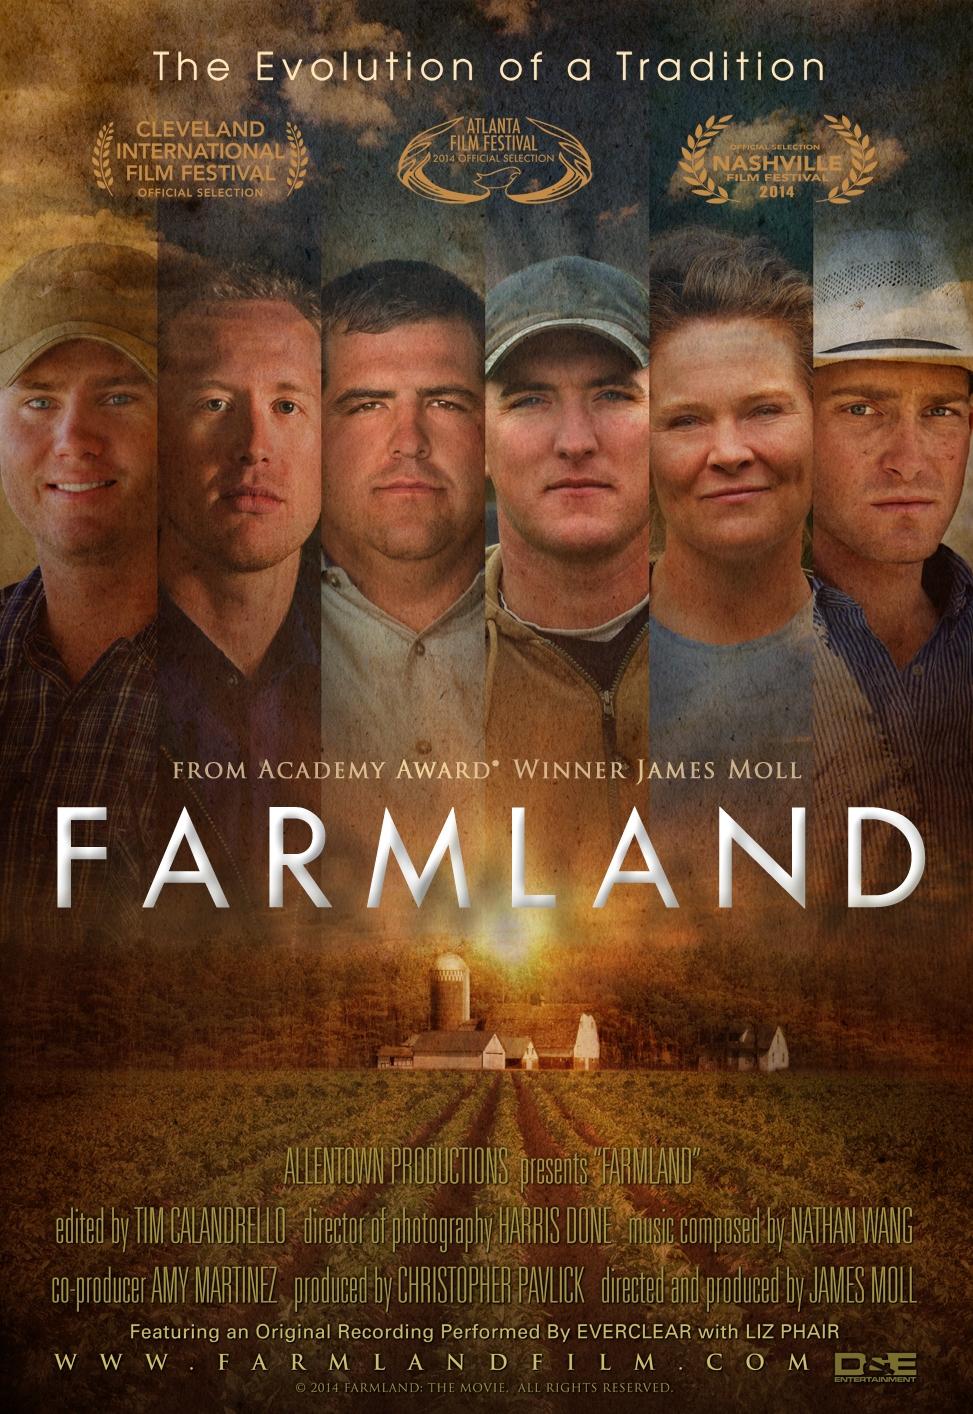 FARMLAND_Poster.jpg